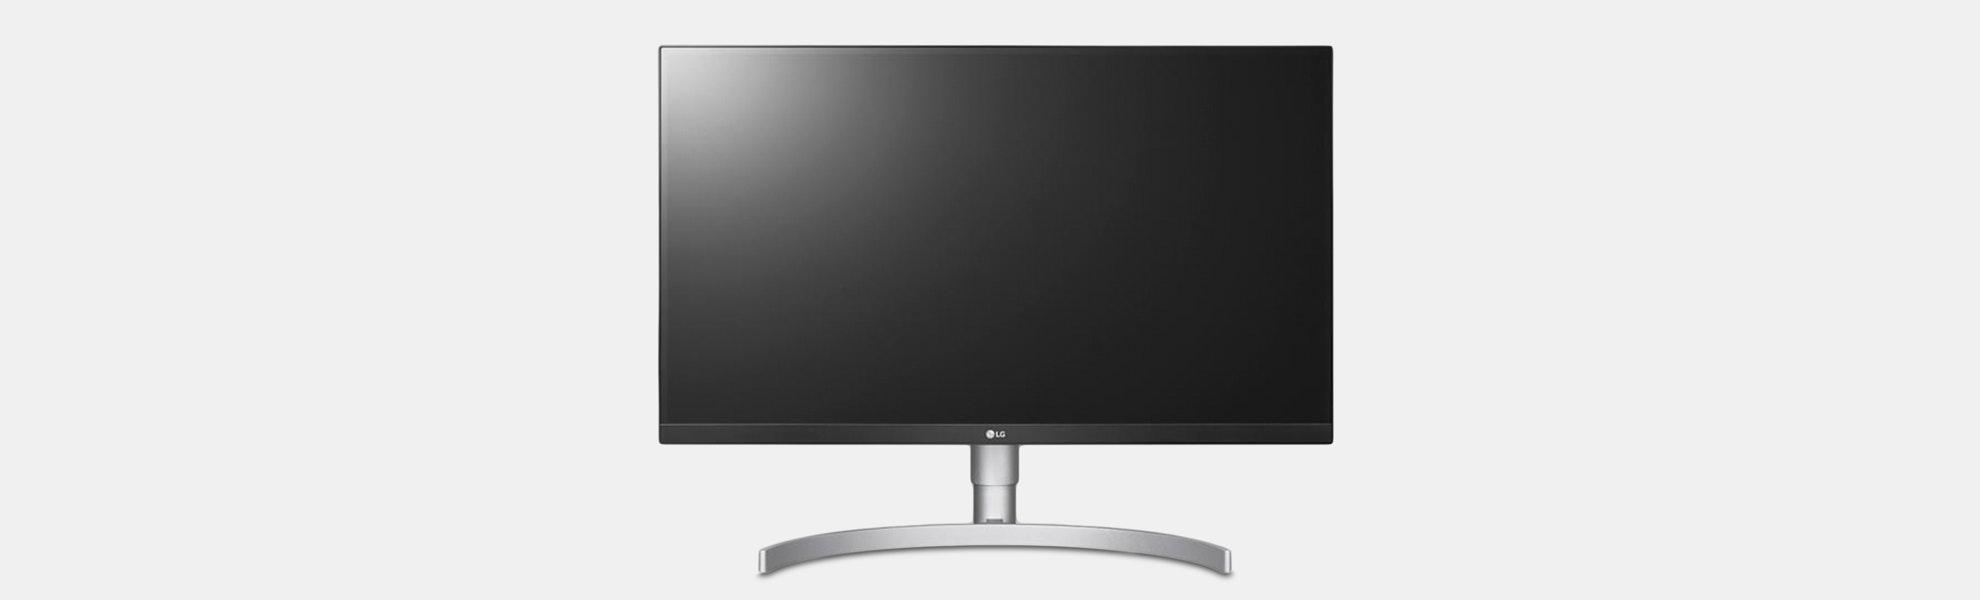 "LG 27"" 4K UHD IPS Monitor w/ HDR 10"